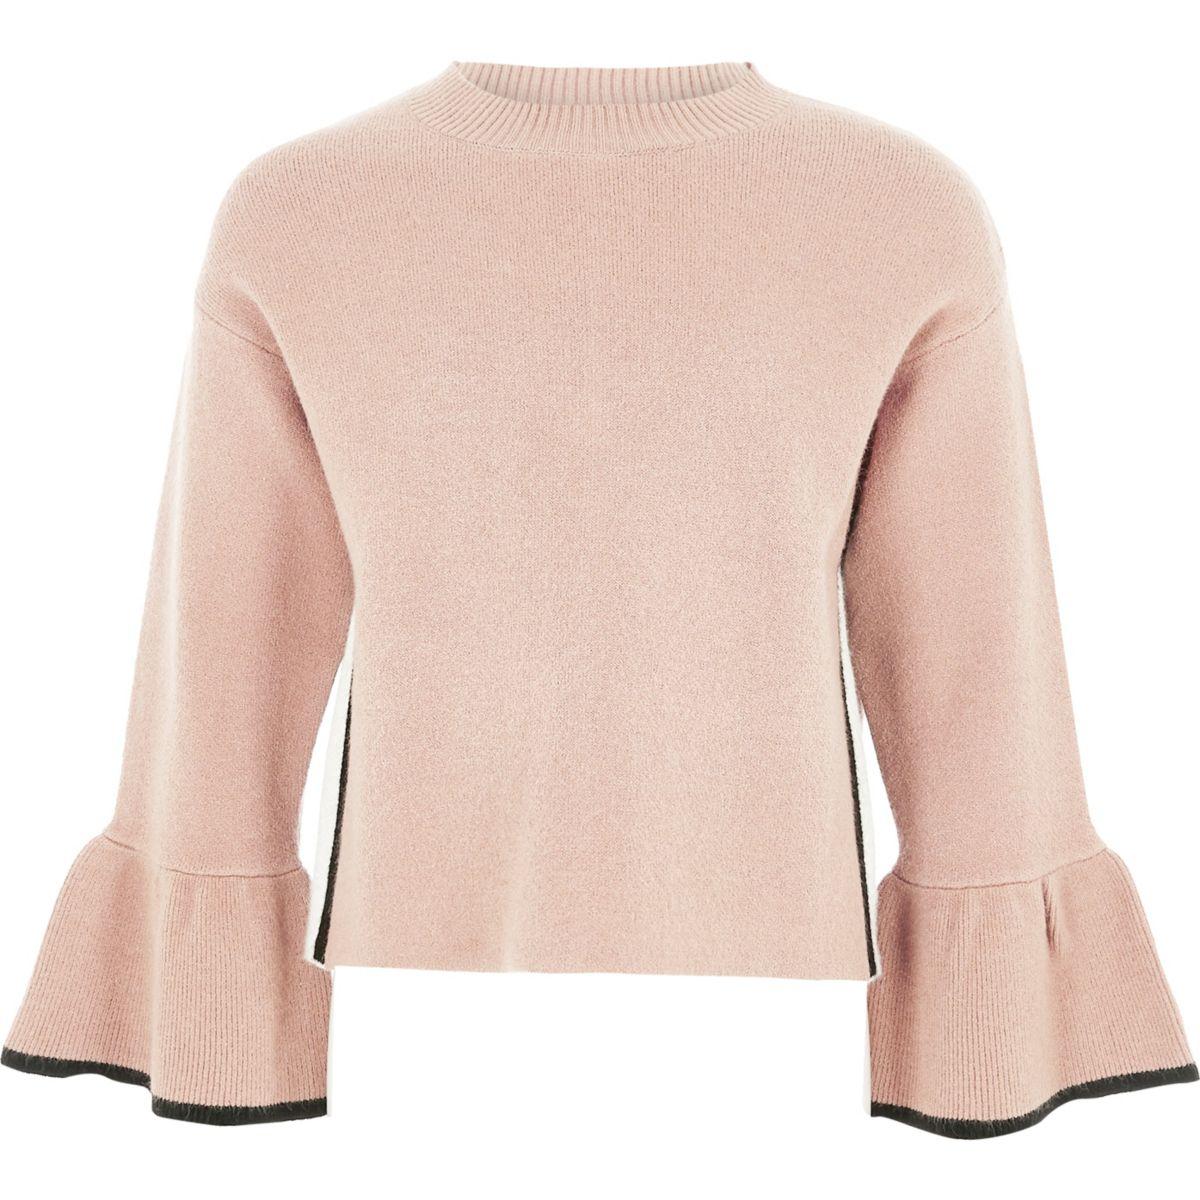 Girls pink knit bell sleeve sweater